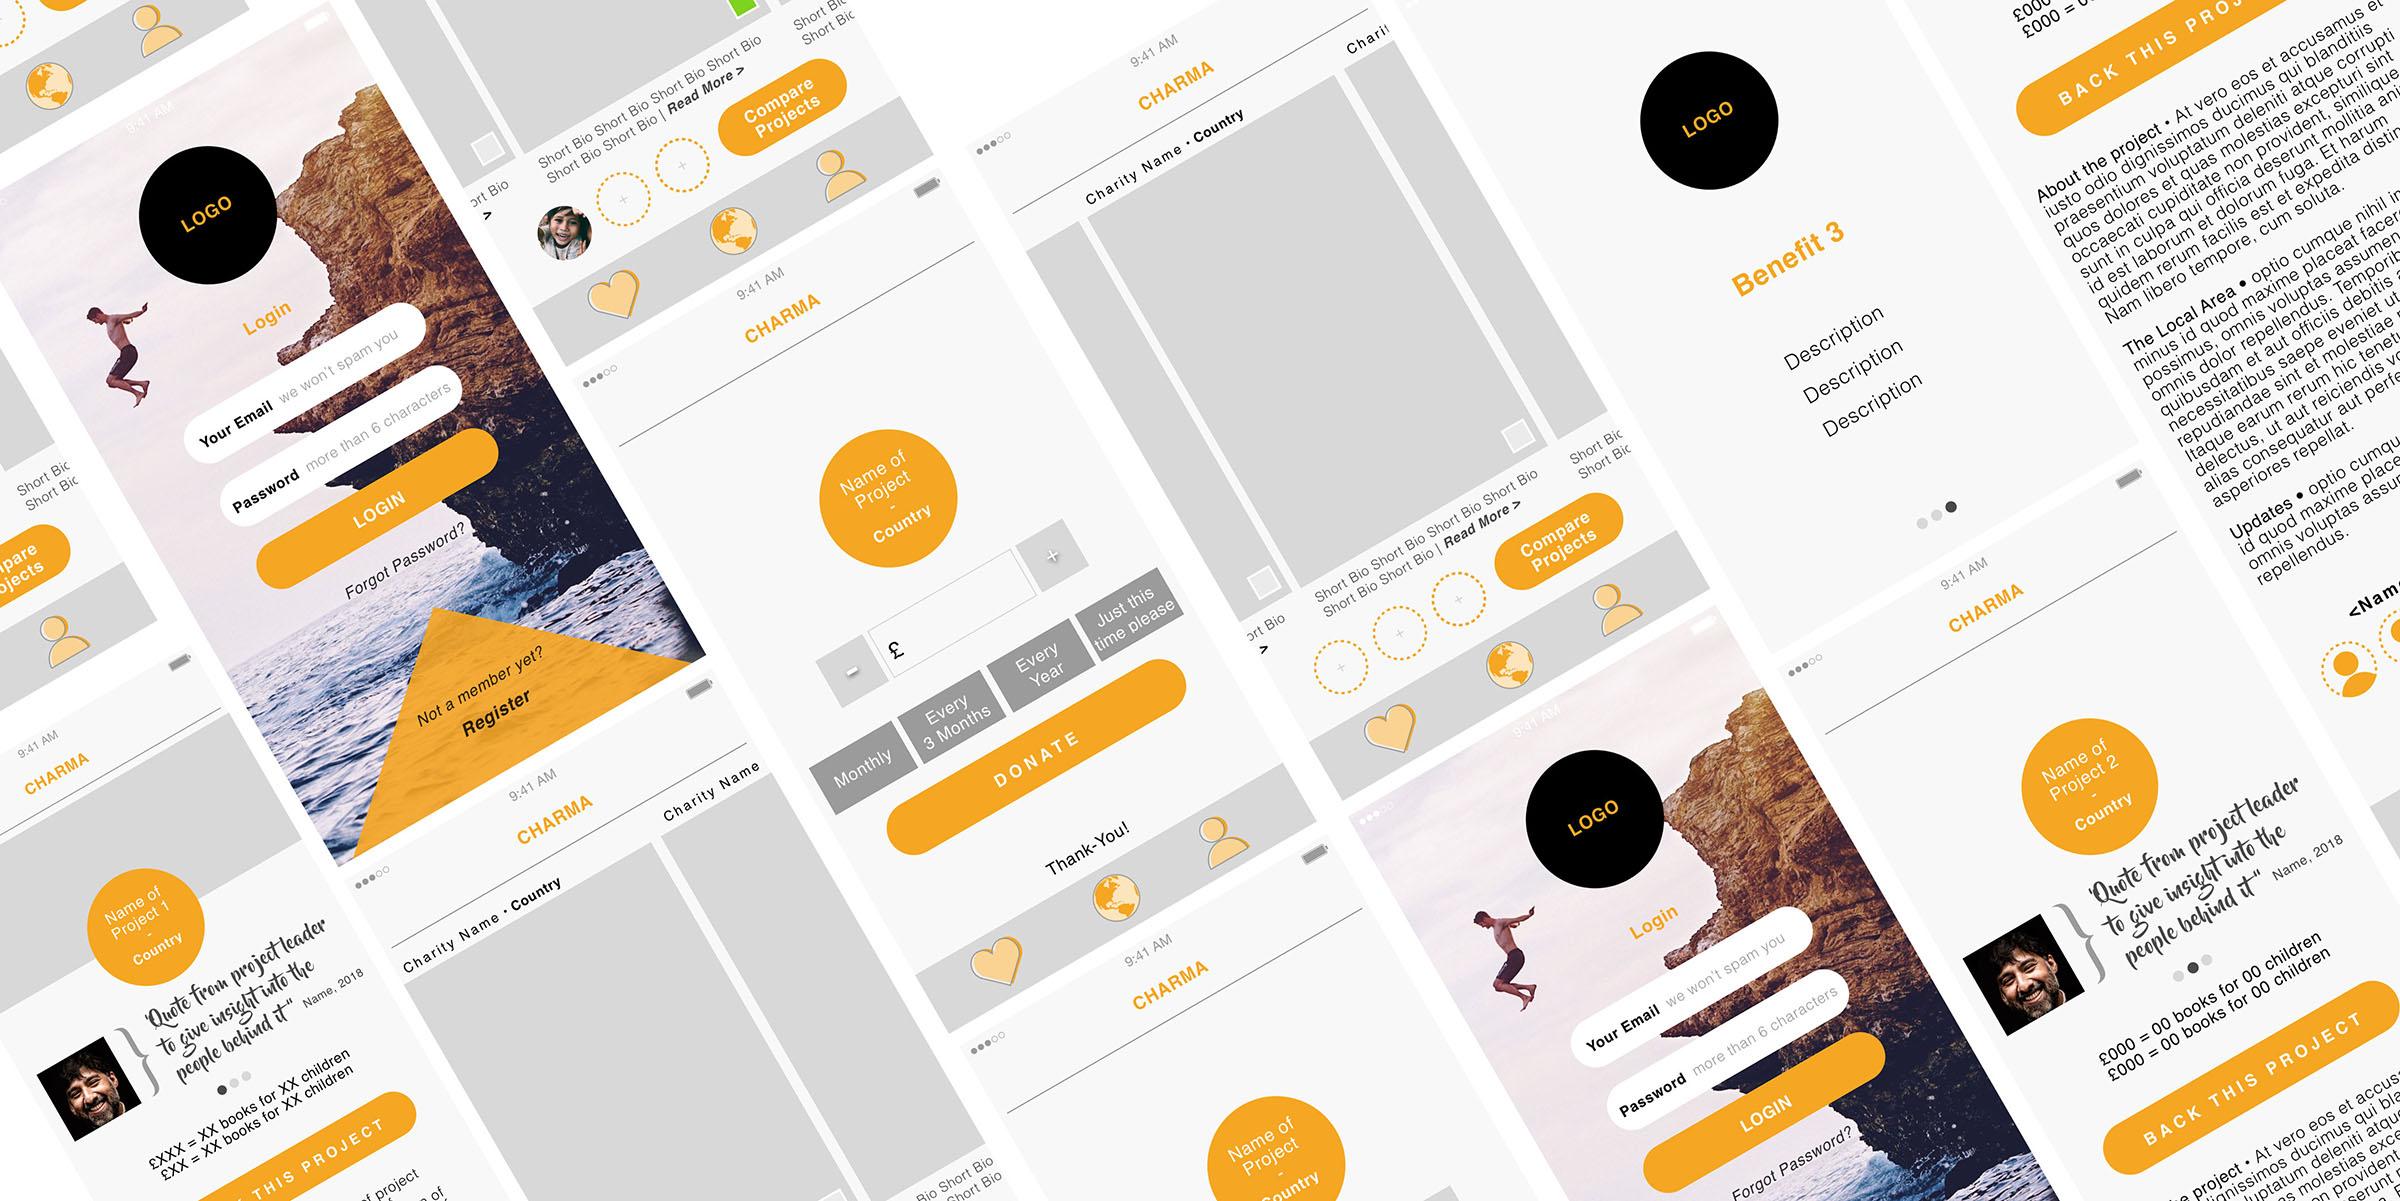 lauren-grace-design-freelance-ux-designer-london-uk-charity-ios-android-app-onboarding-wireframes.jpg